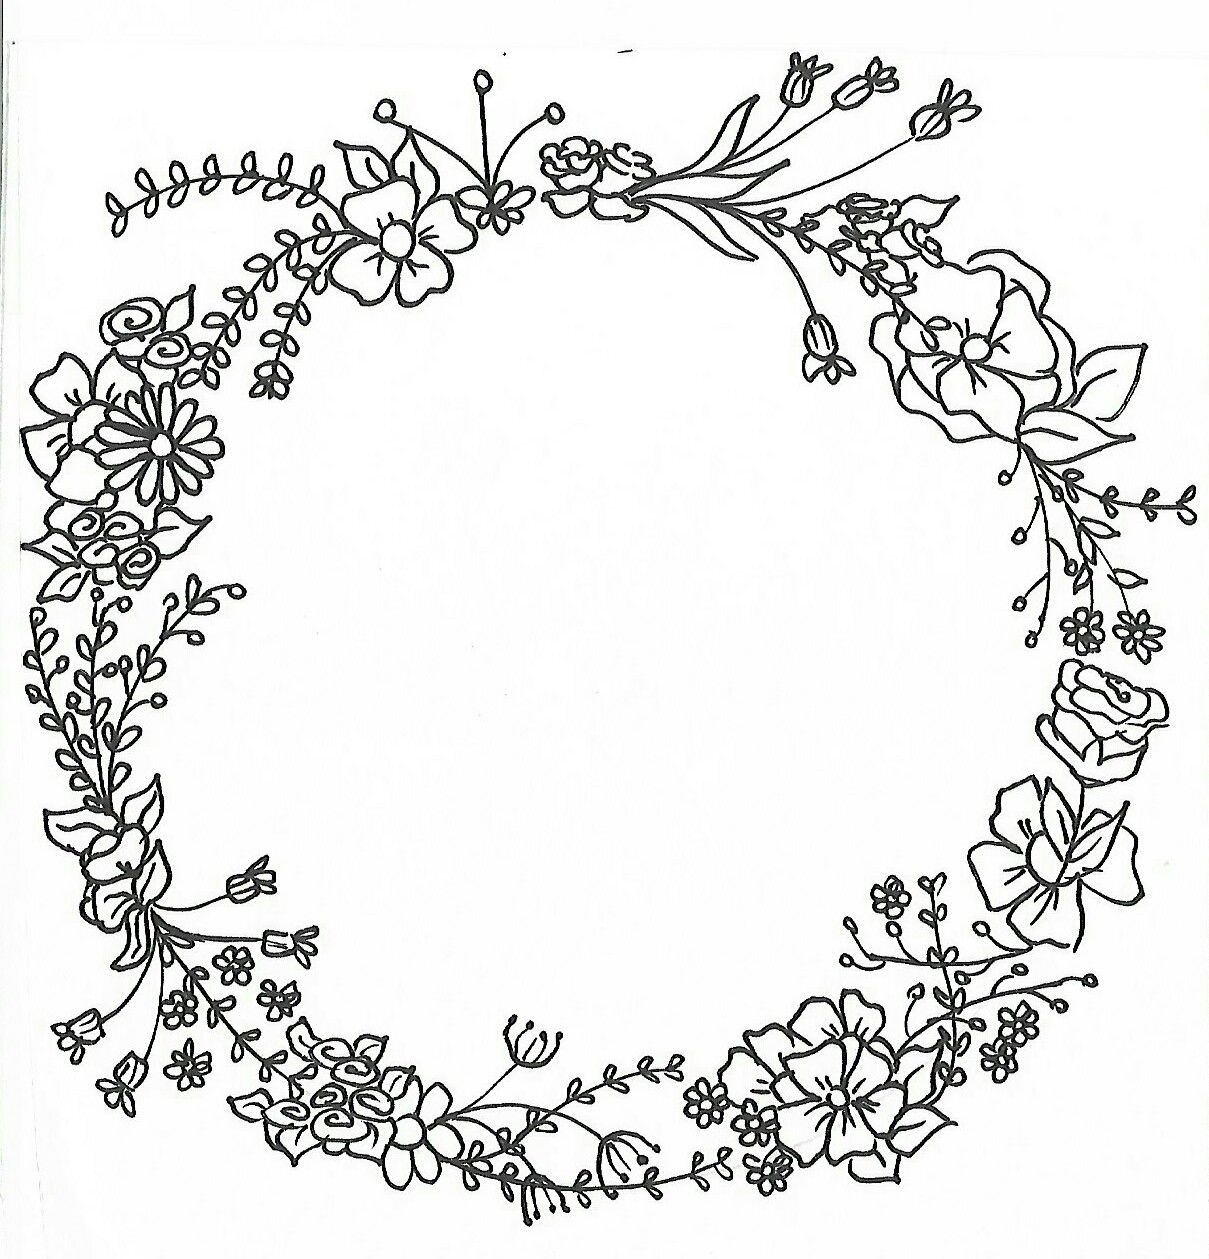 Drawn Line Succulent Wreath